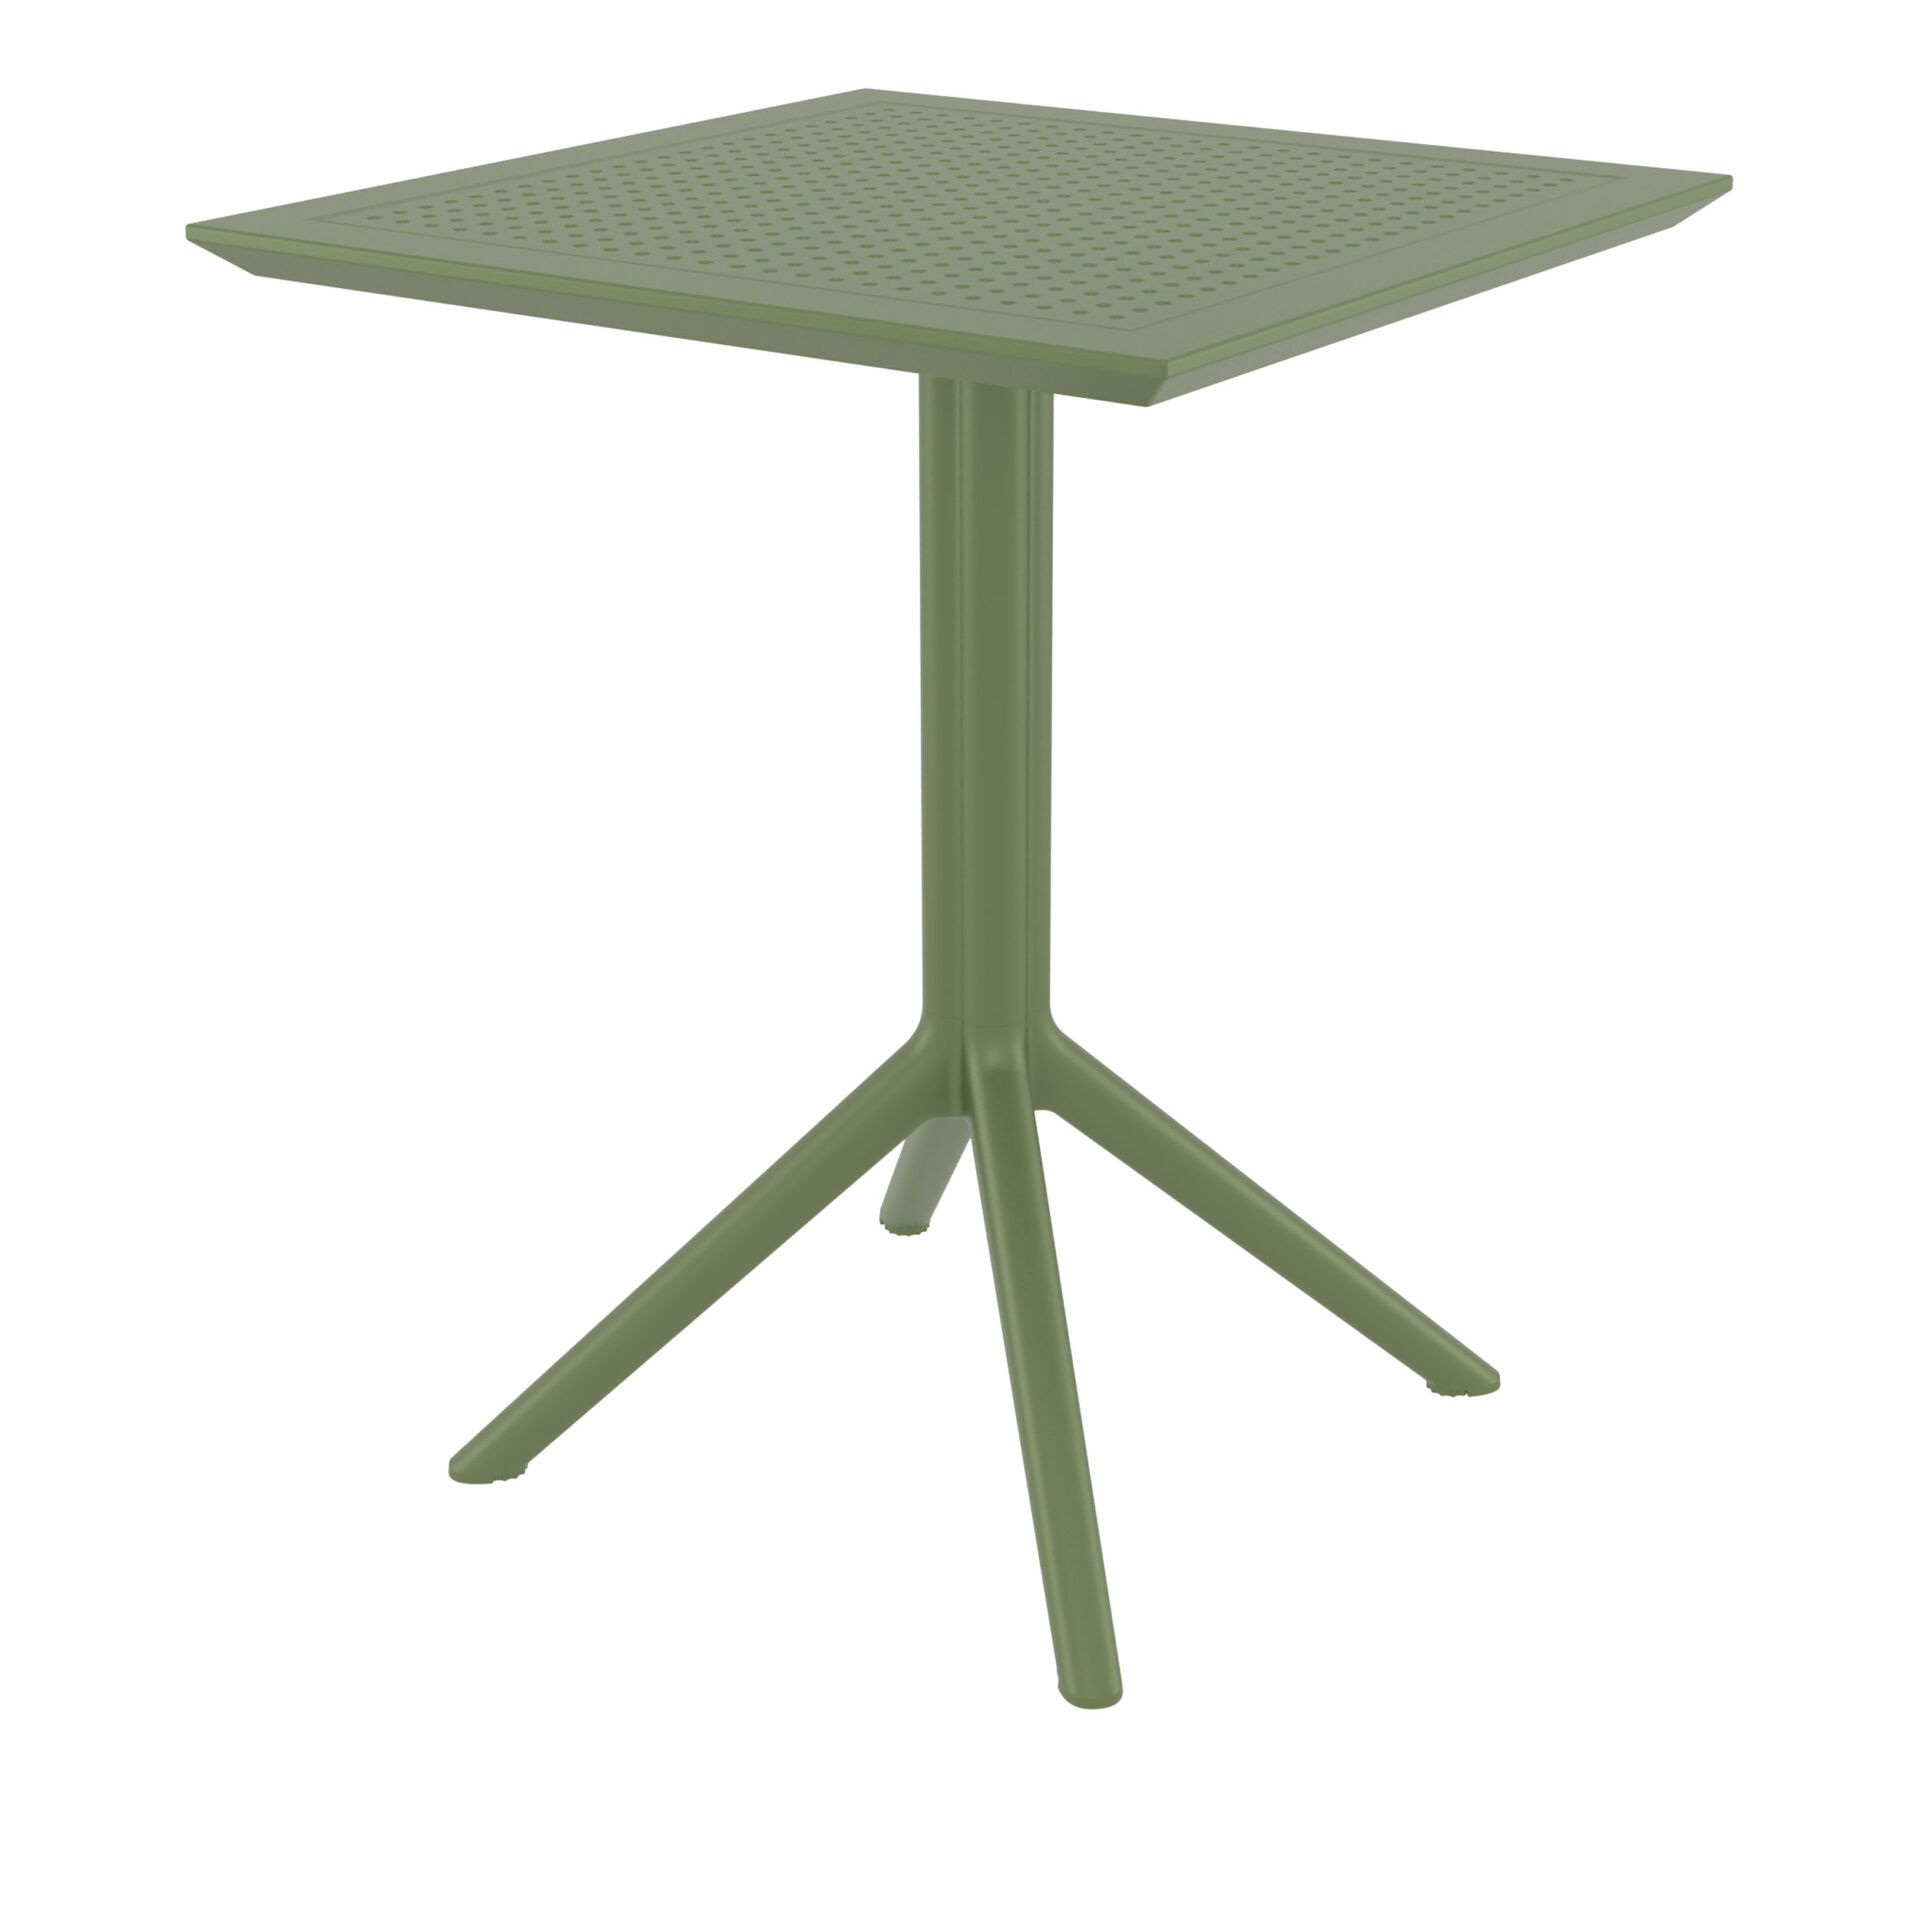 polypropylene outdoor sky folding bar table 60 olive green front side